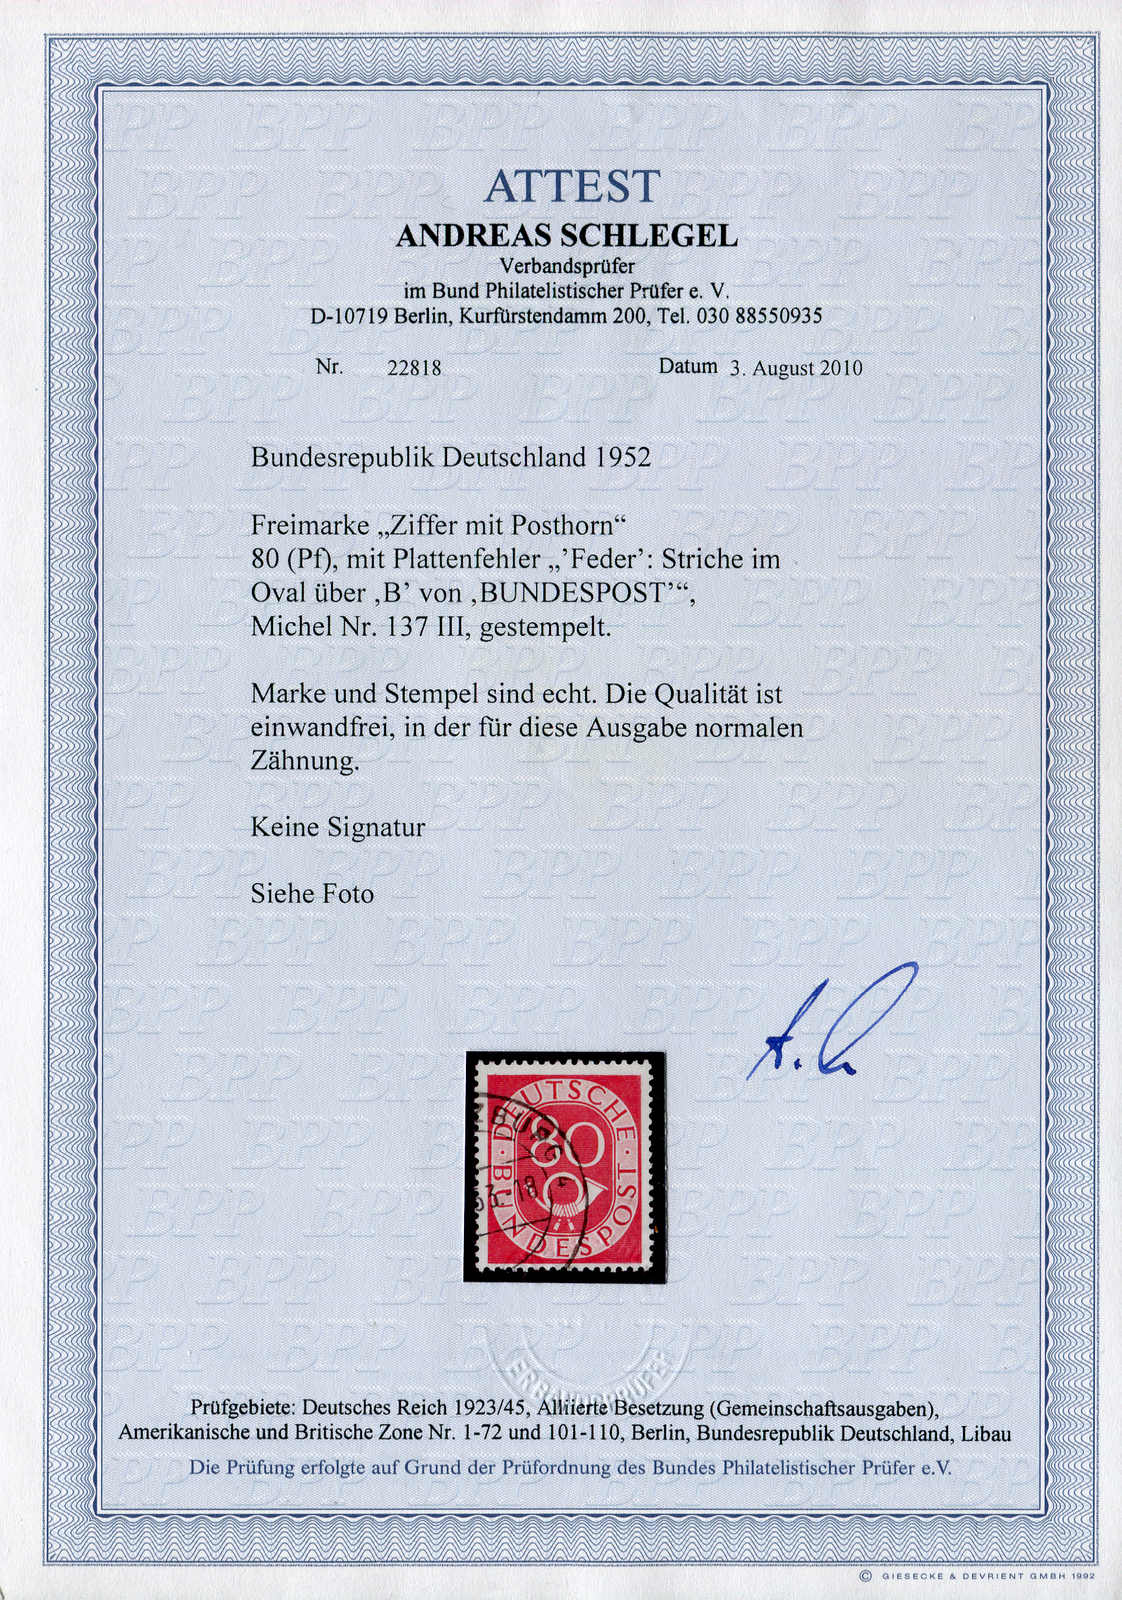 Lot 8379 - federal republic of germany bundesrepublik deutschland -  Auktionshaus Schlegel 26 Public Auction